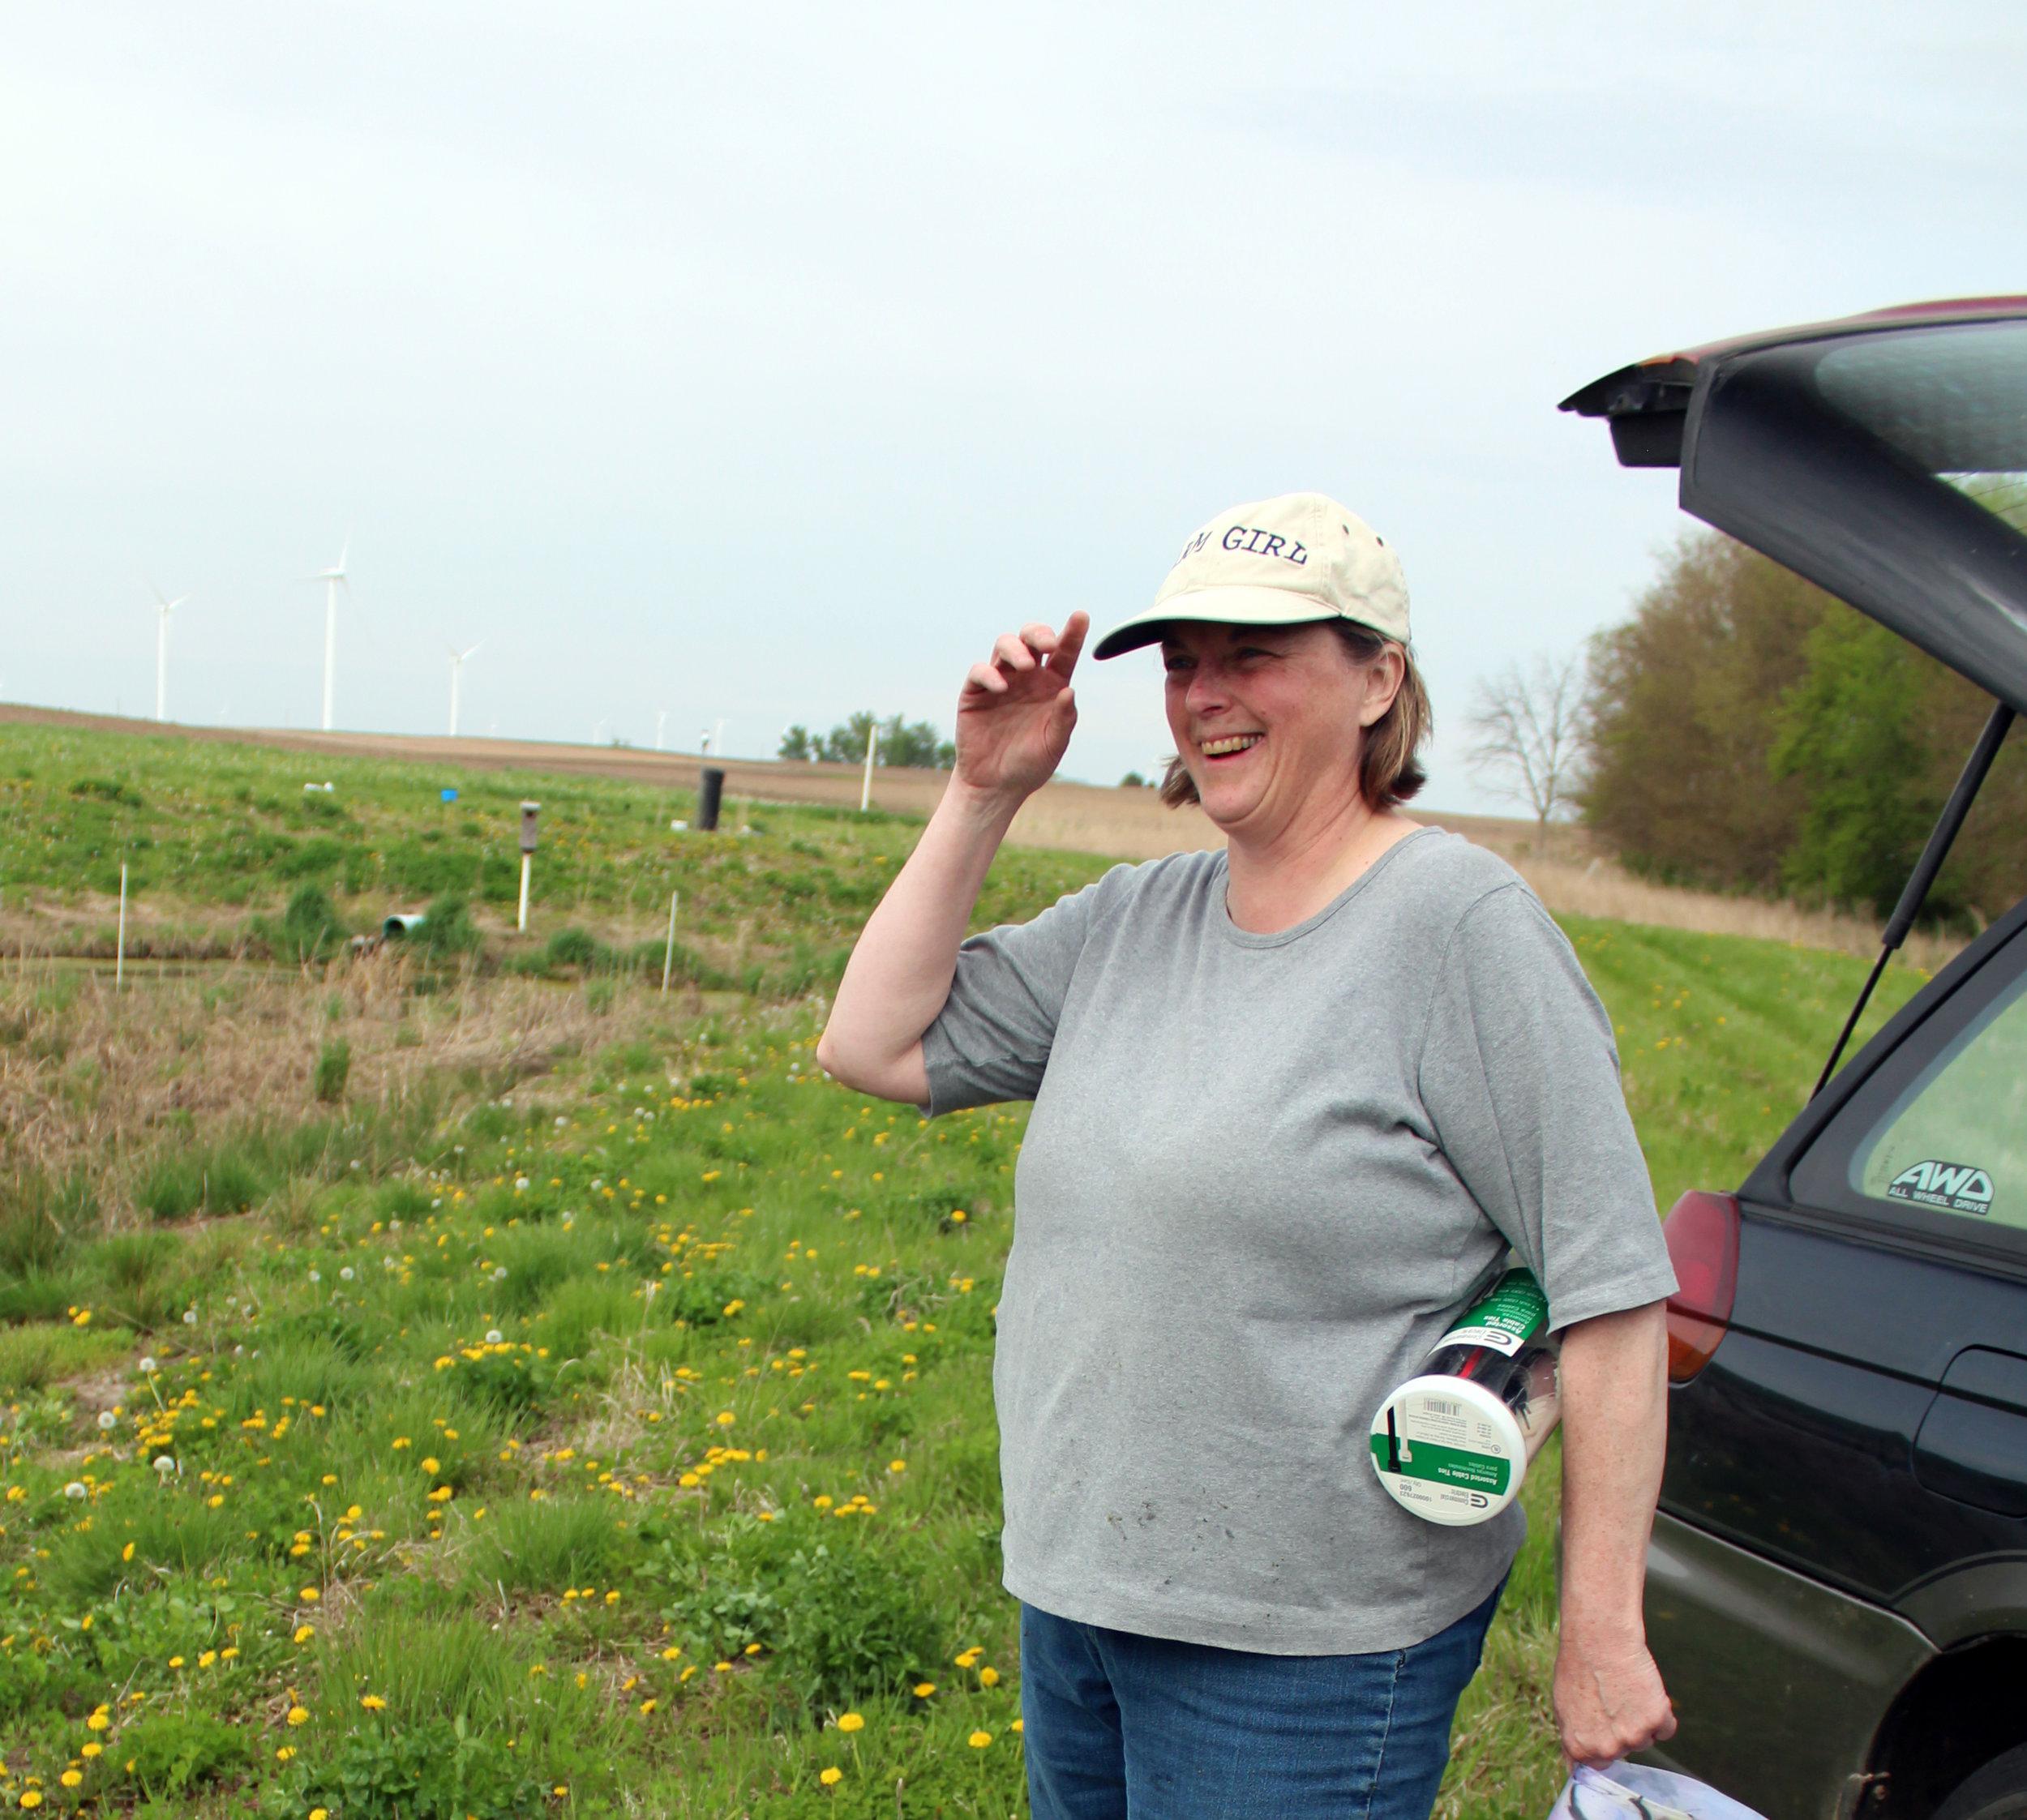 Jean_Farm Girl meet wetland.jpg